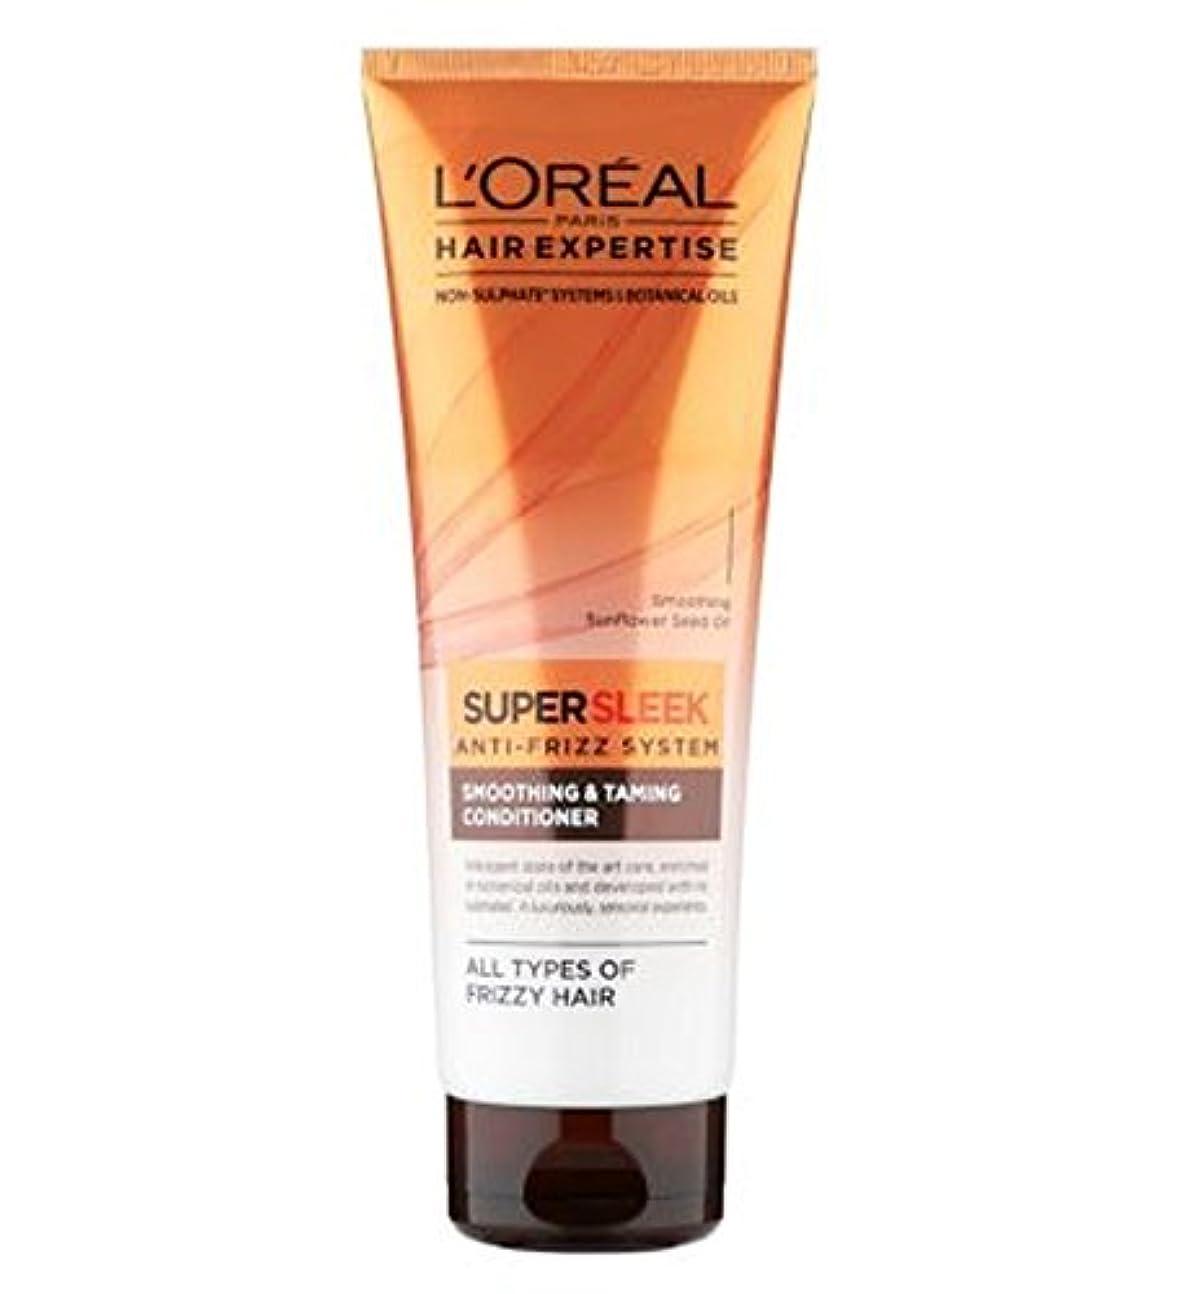 L'Oreall髪の専門知識Supersleekコンディショナー250ミリリットル (L'Oreal) (x2) - L'Oreall Hair Expertise SuperSleek Conditioner 250ml...